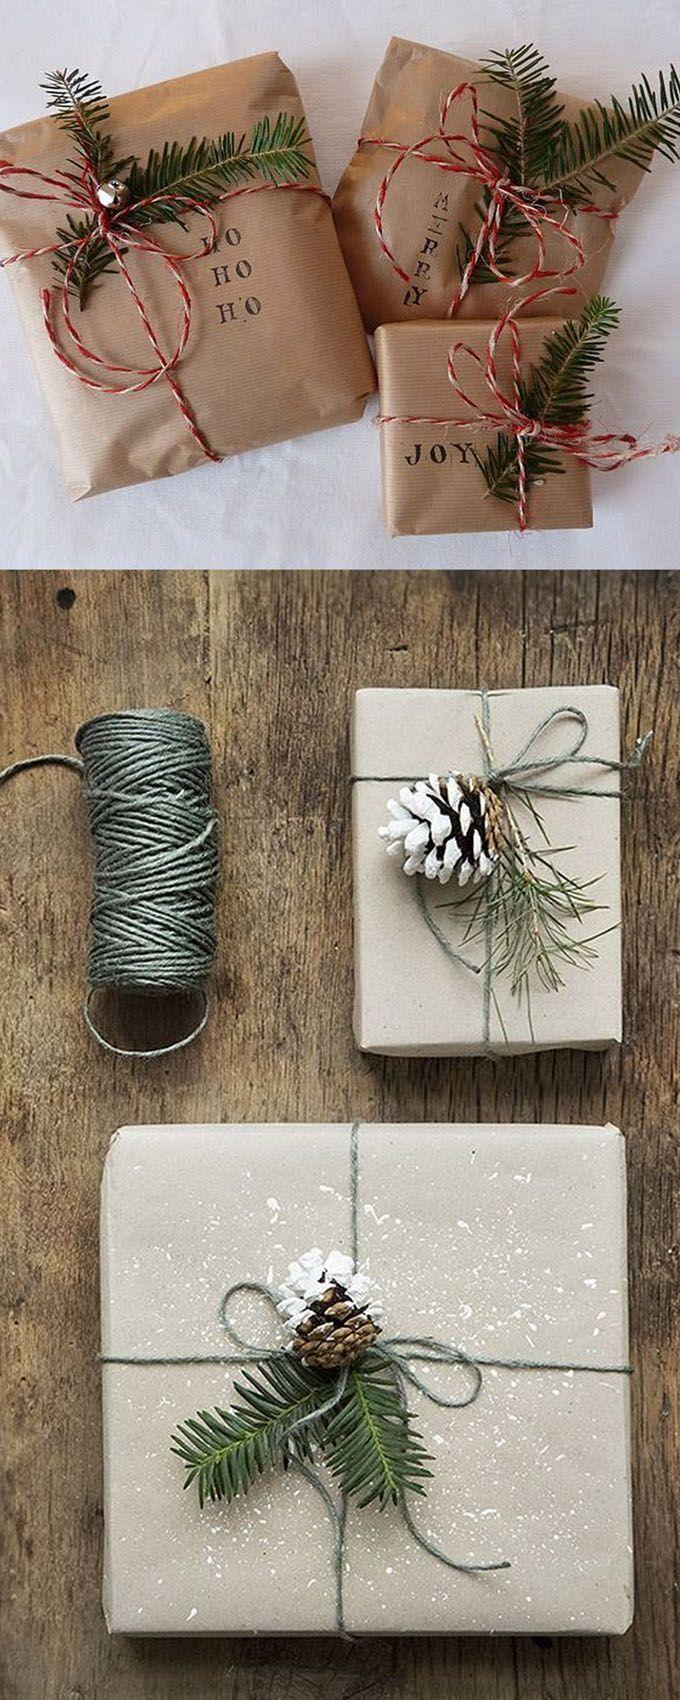 Leather Accent Tag - Fresh Pine Tag by VIDA VIDA N7RUn